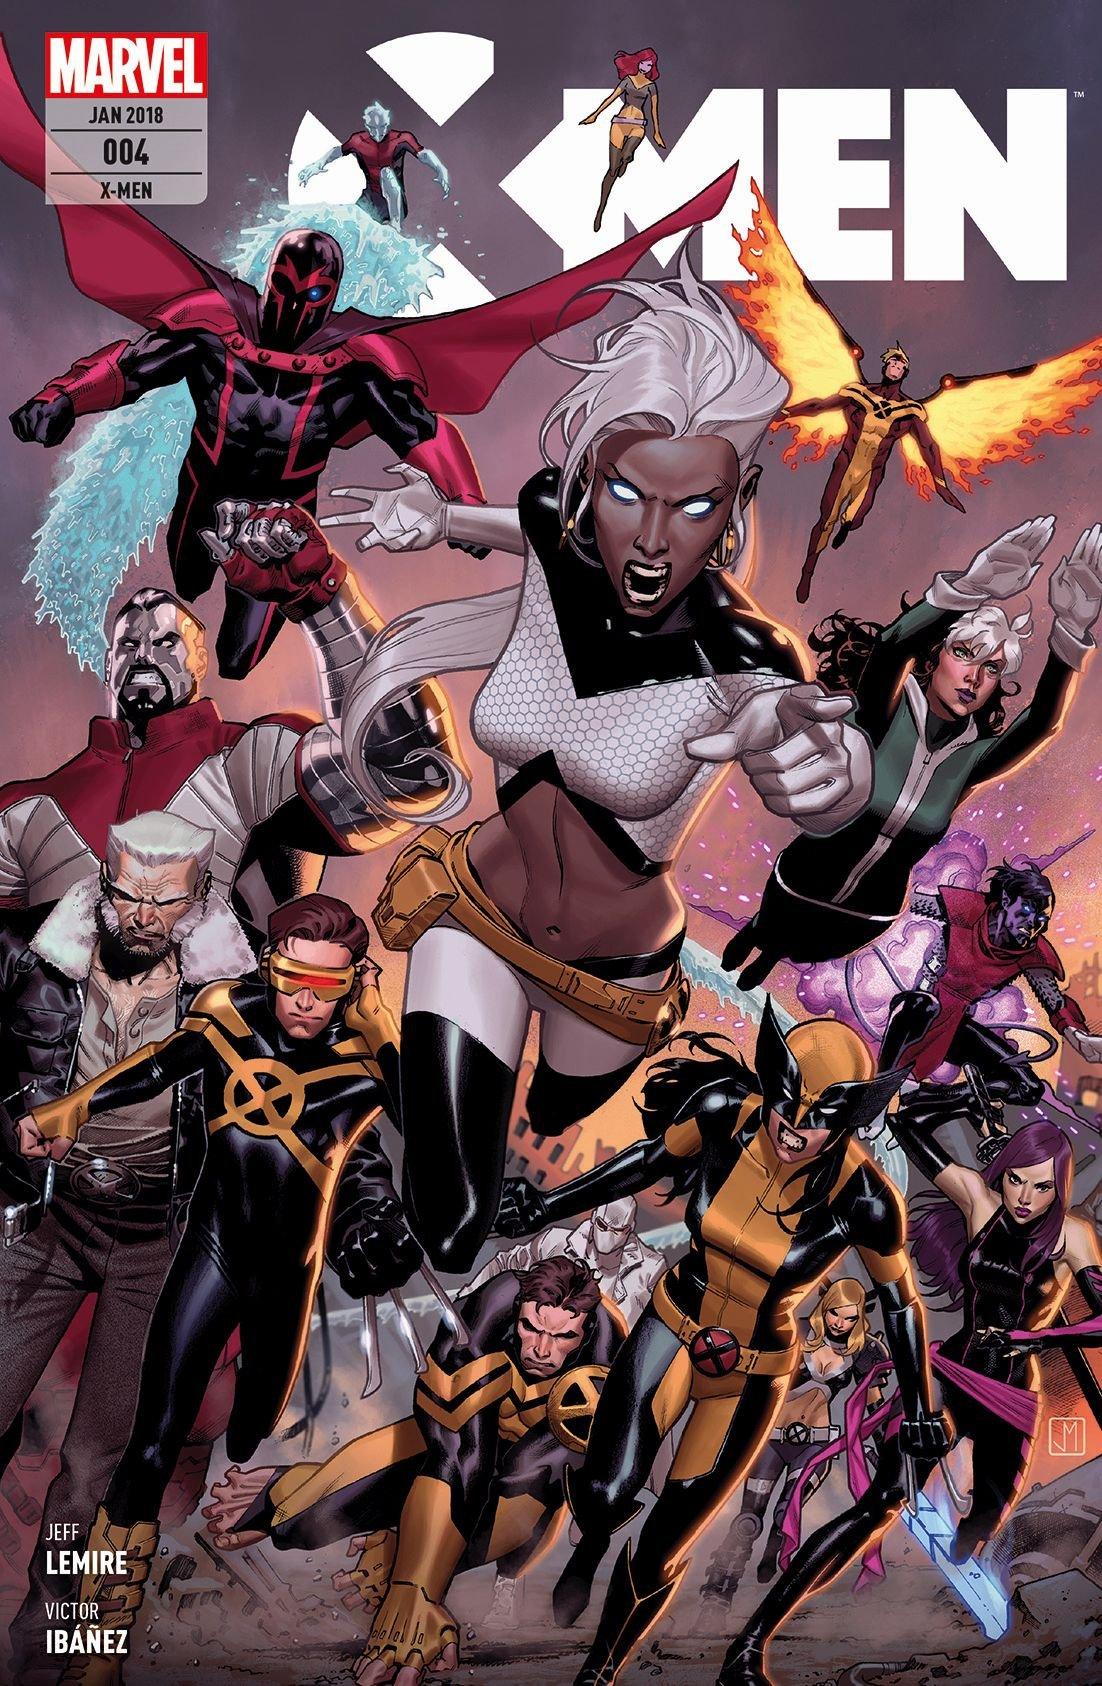 X-Men: Bd. 4 (2. Serie): Zu neuen Ufern Taschenbuch – 4. Dezember 2017 Jeff Lemire Victor Ibáñez Cullen Bunn Marc Guggenheim